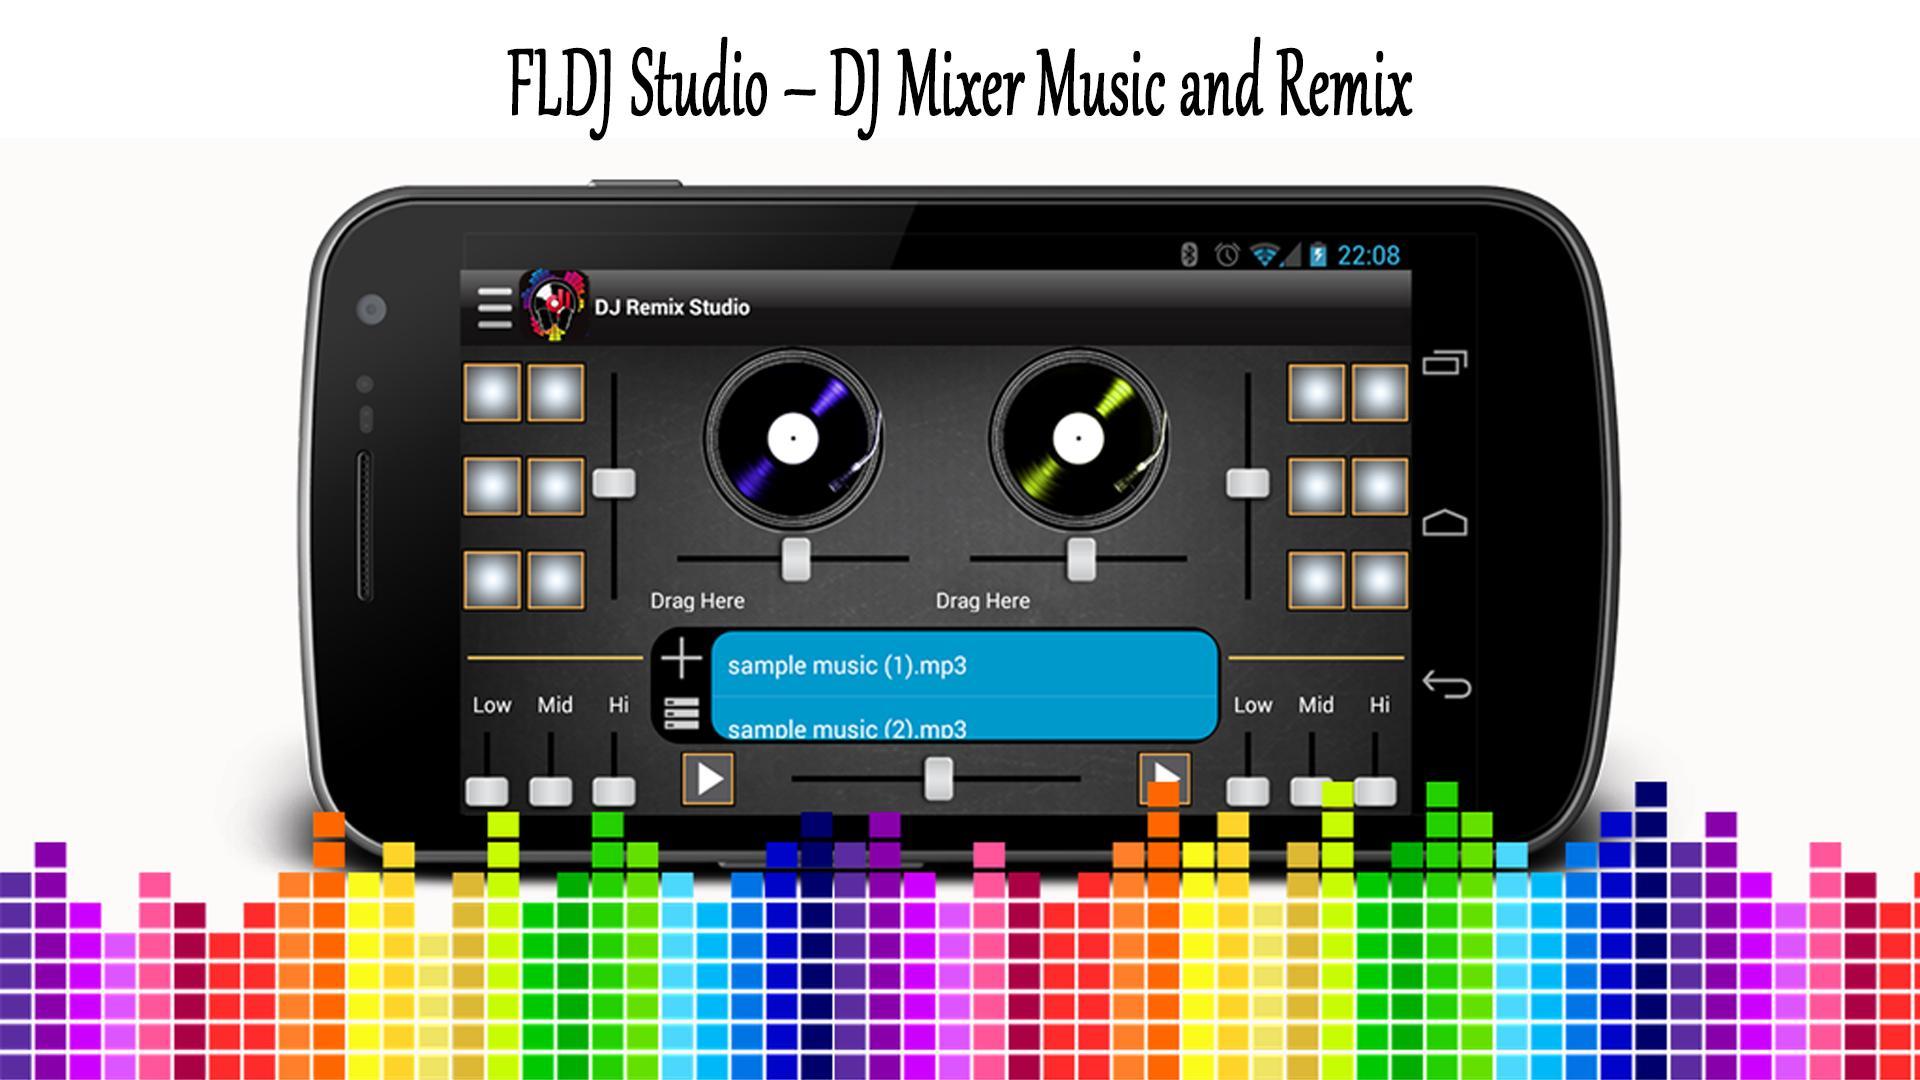 FLDJ Studio –Dj Mixer music with VIRTUAL FL STUDIO for Android - APK